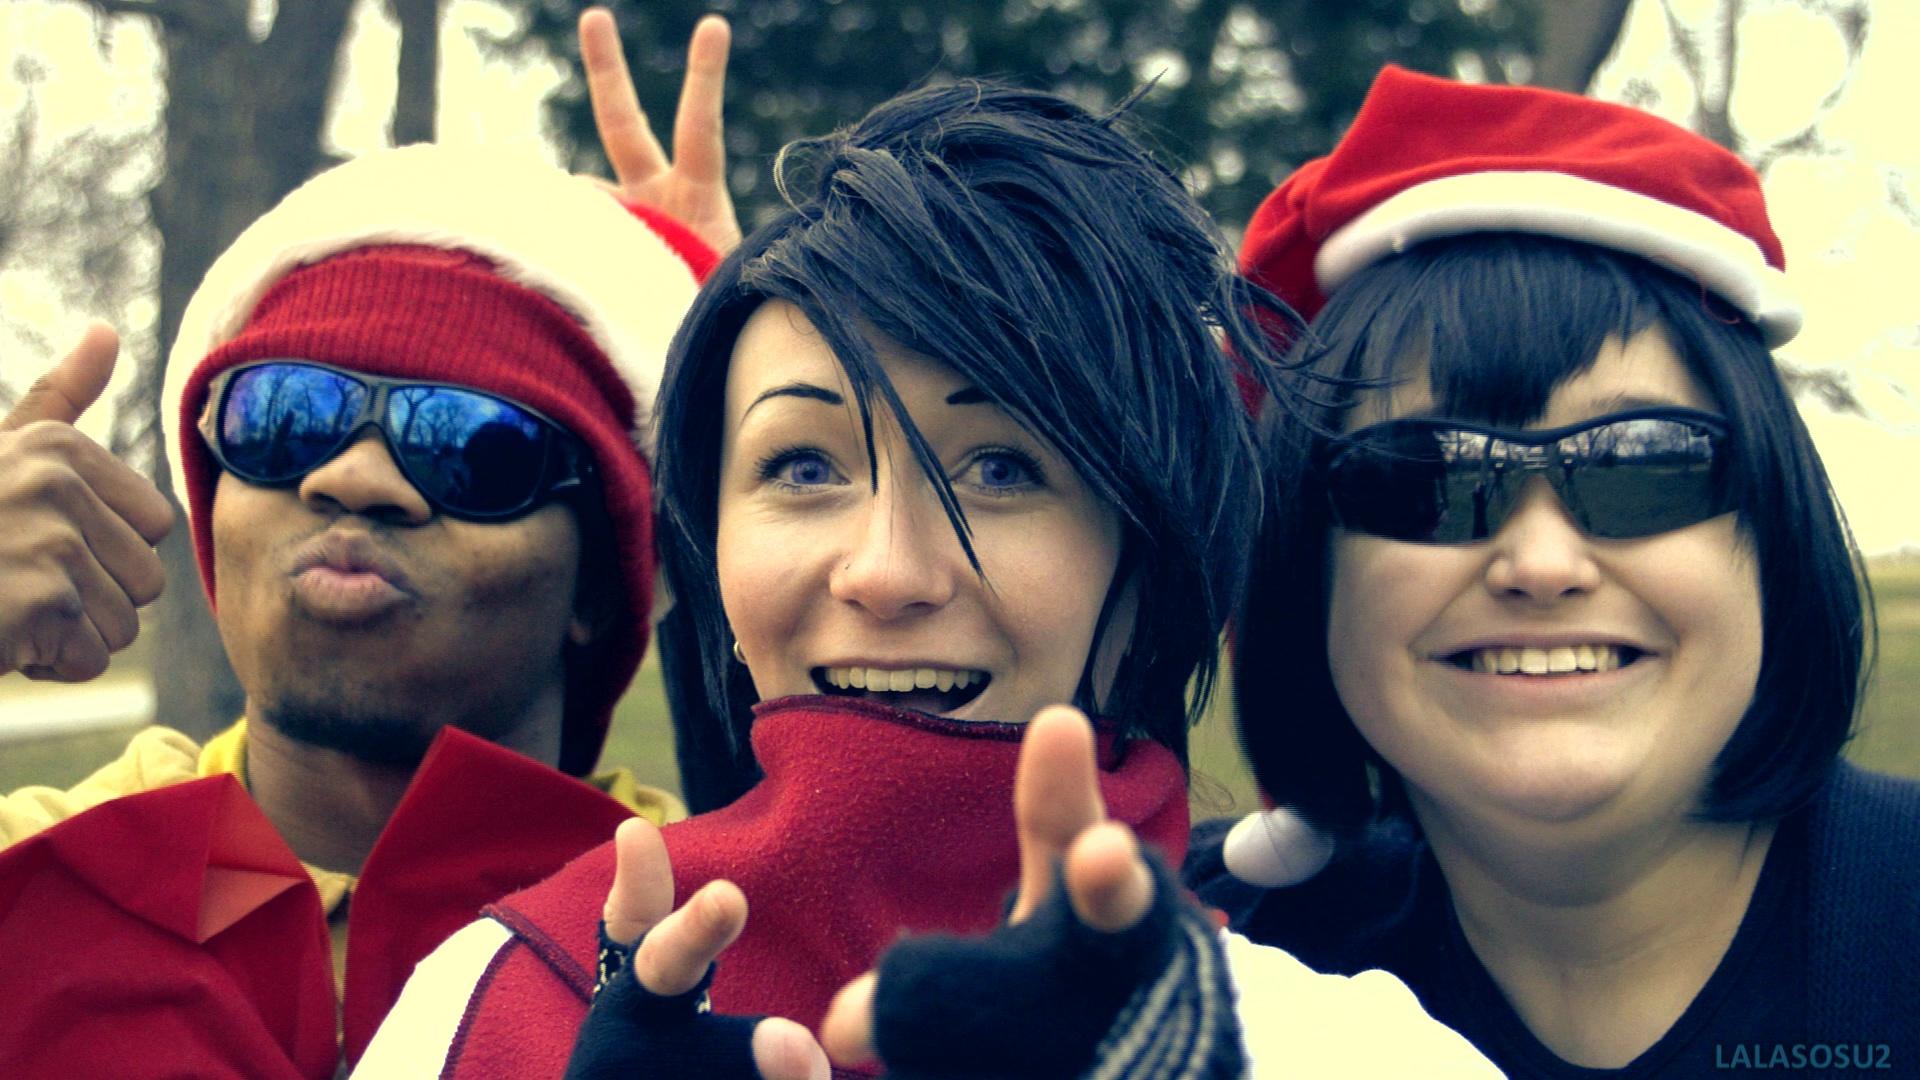 Merry Christmas - Danny Phantom Crew by LALASOSU2